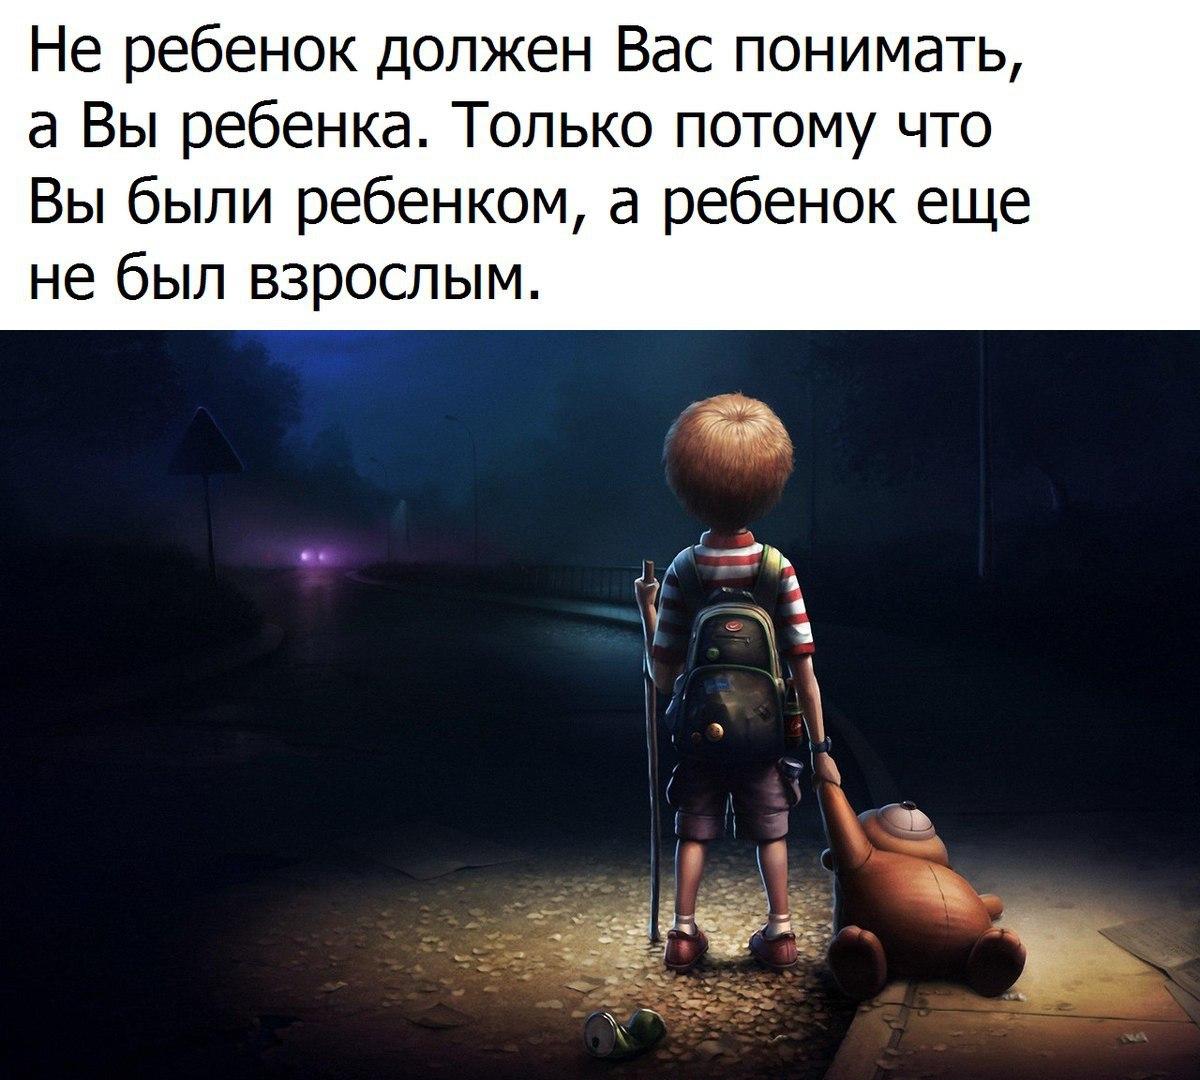 https://pp.vk.me/c626718/v626718567/3c661/oQcGosNXy78.jpg